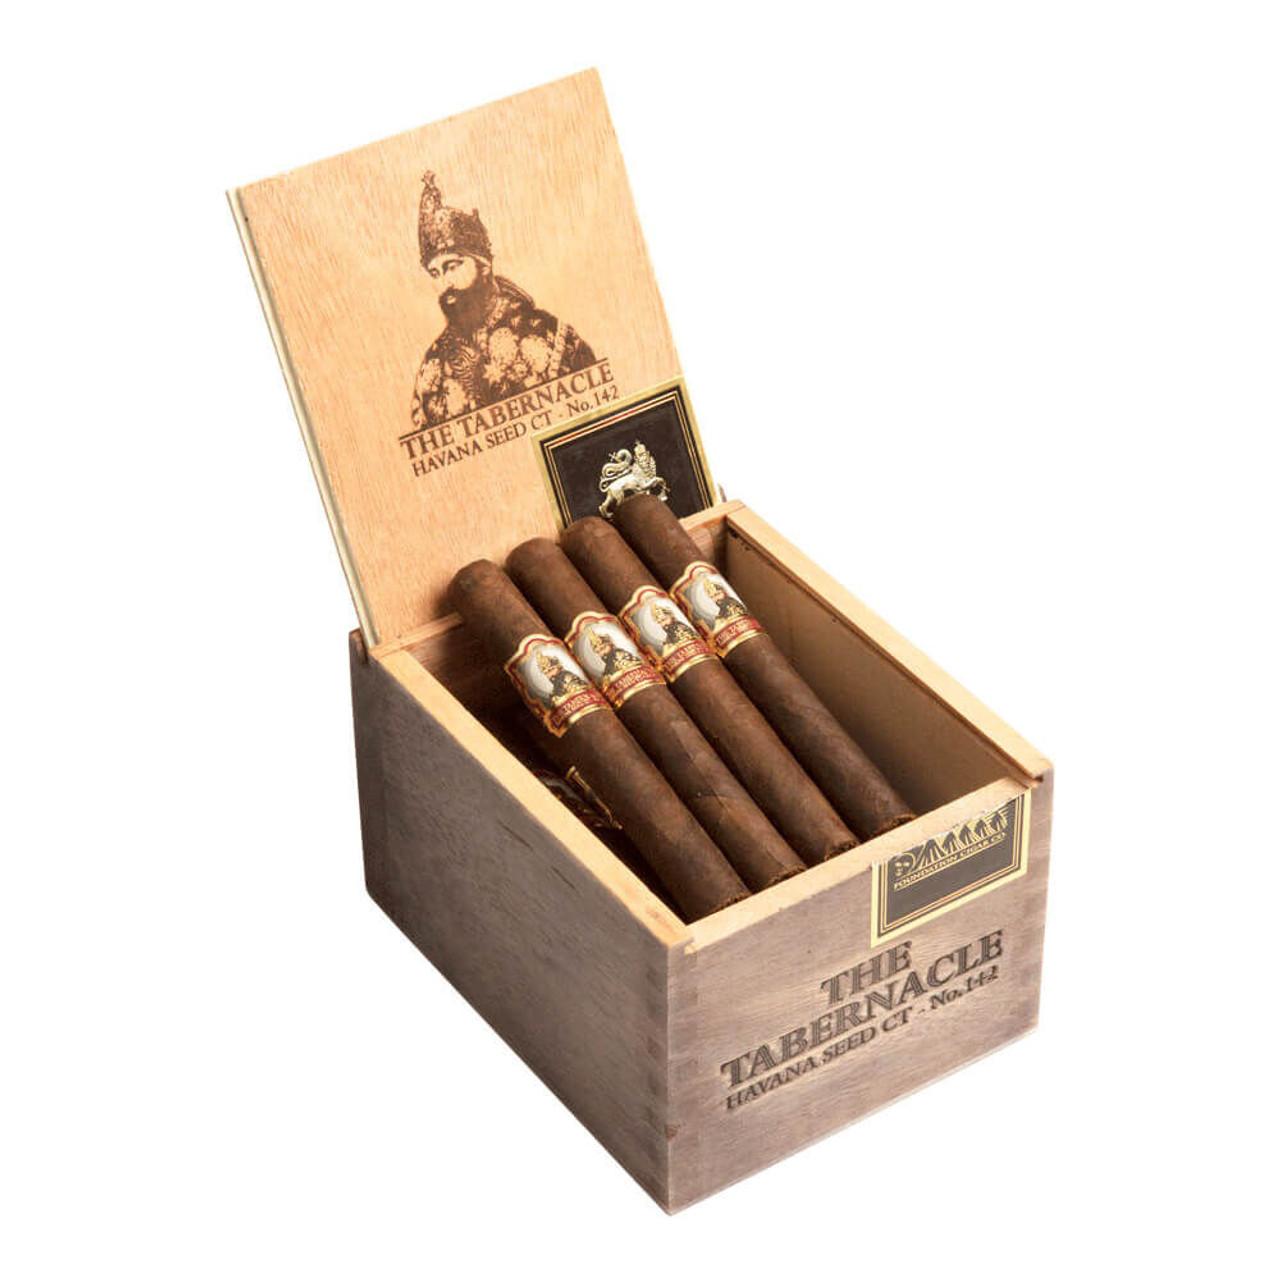 Foundation The Tabernacle No. 142 Havana Seed CT Corona Cigars - 5.25 x 46 (Box of 24)